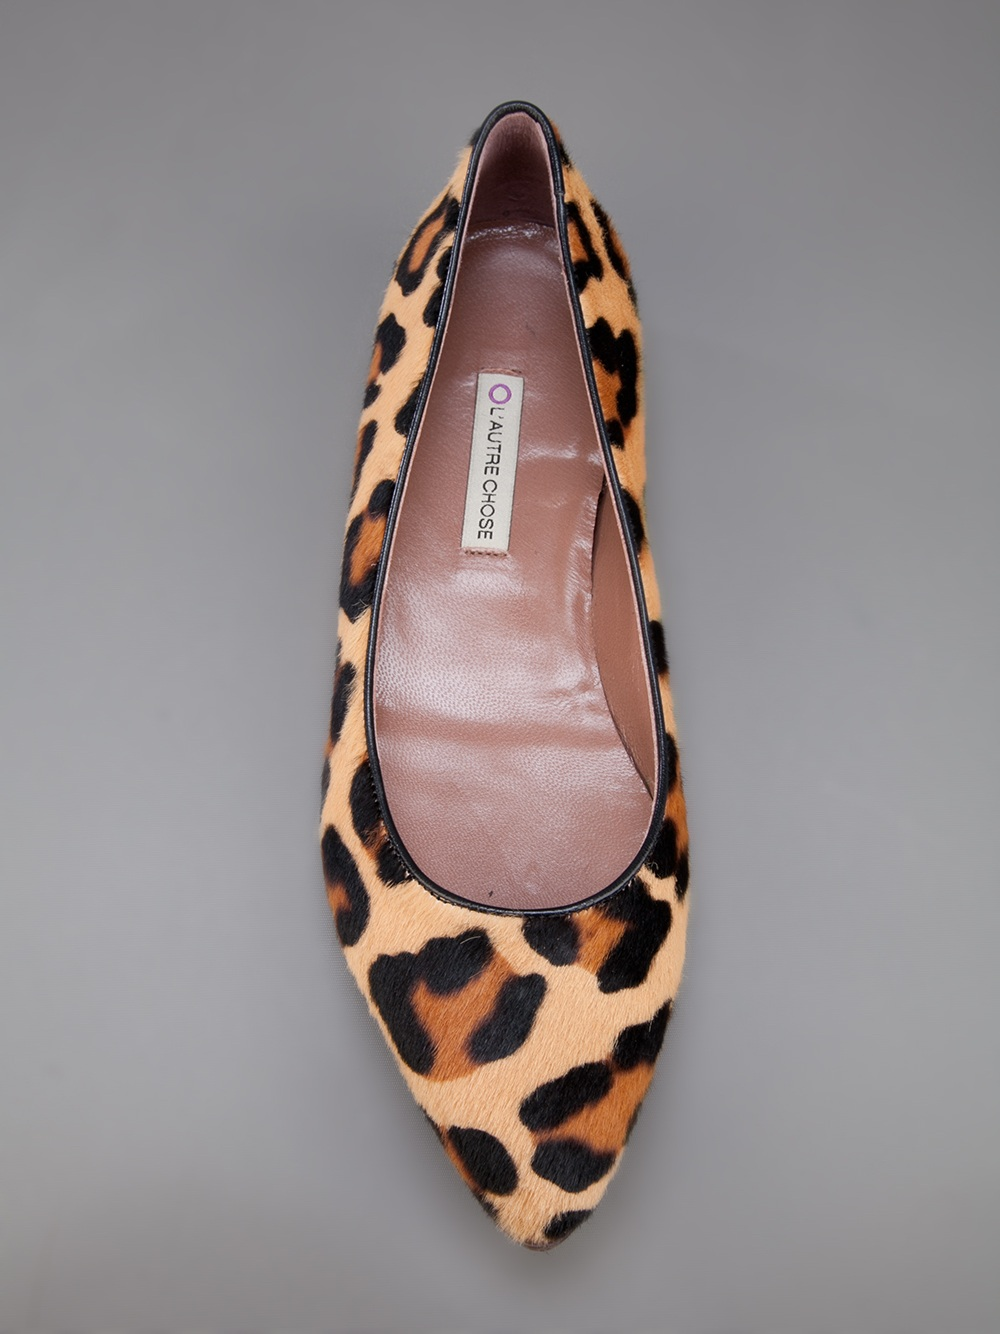 31eebc8155d L'Autre Chose Leopard Print Ballerina Pump - Lyst